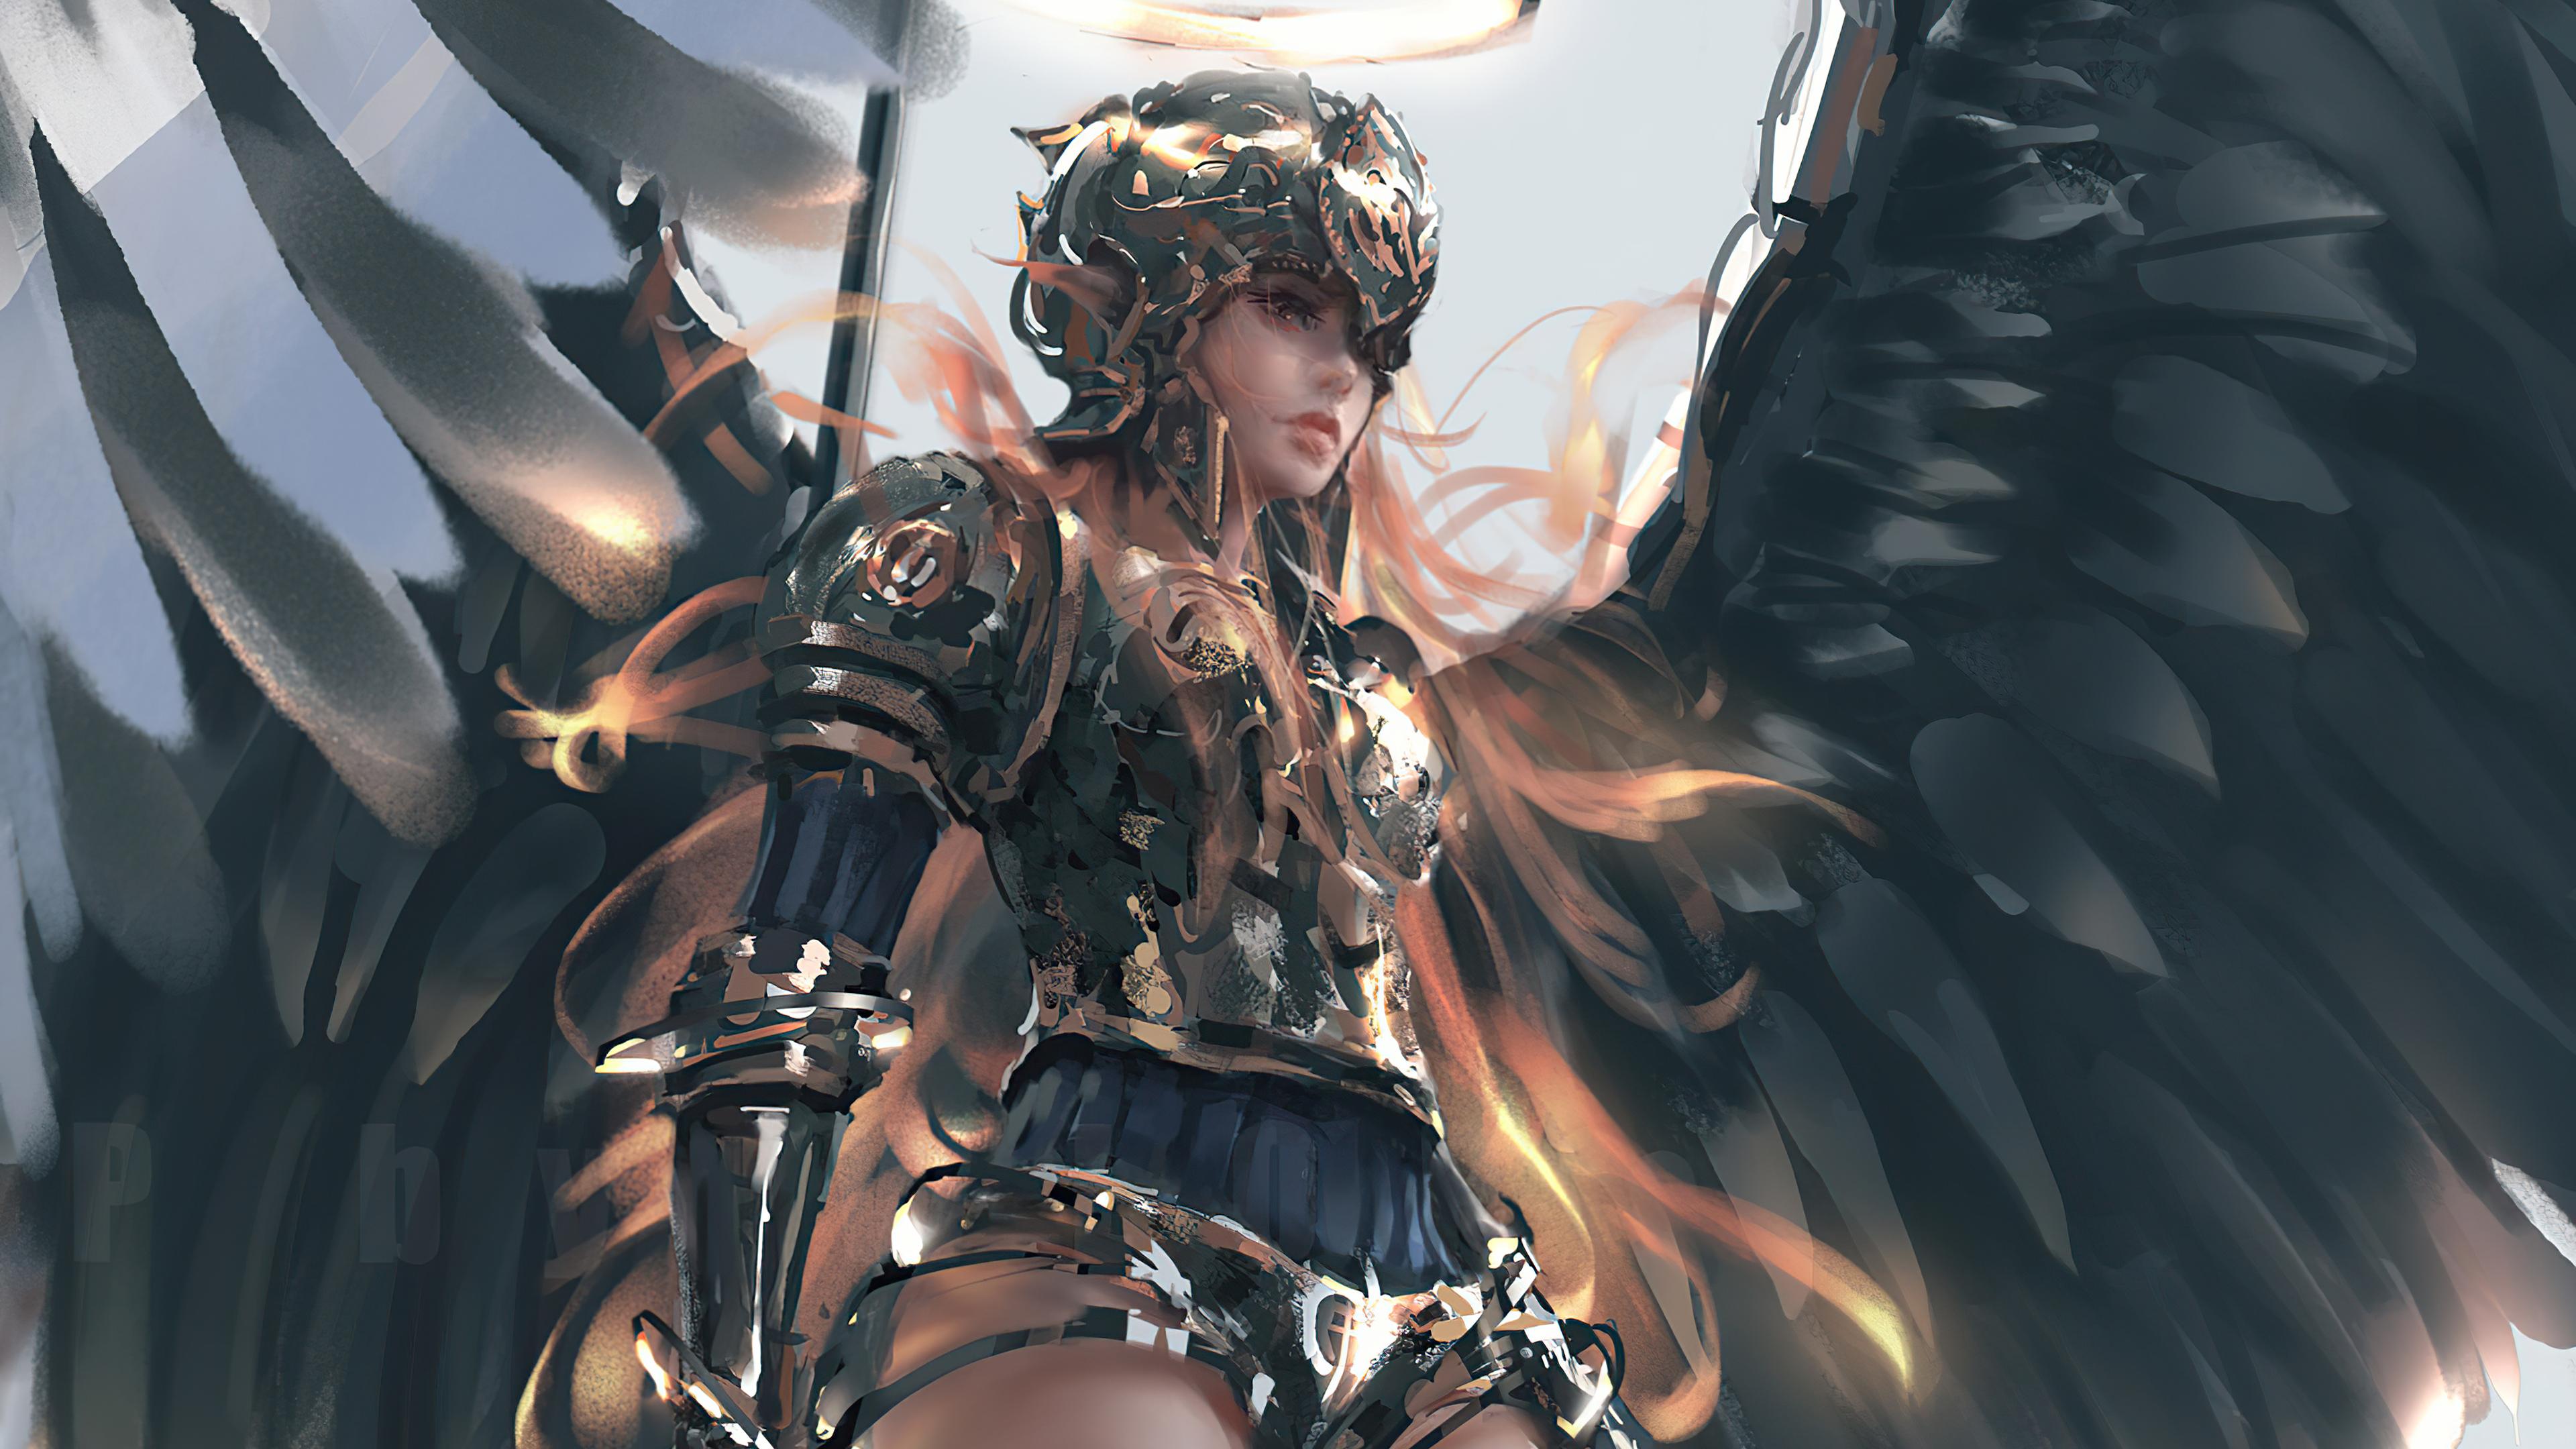 queen of warrior land 4k 1618131998 - Queen Of Warrior Land 4k - Queen Of Warrior Land 4k wallpapers